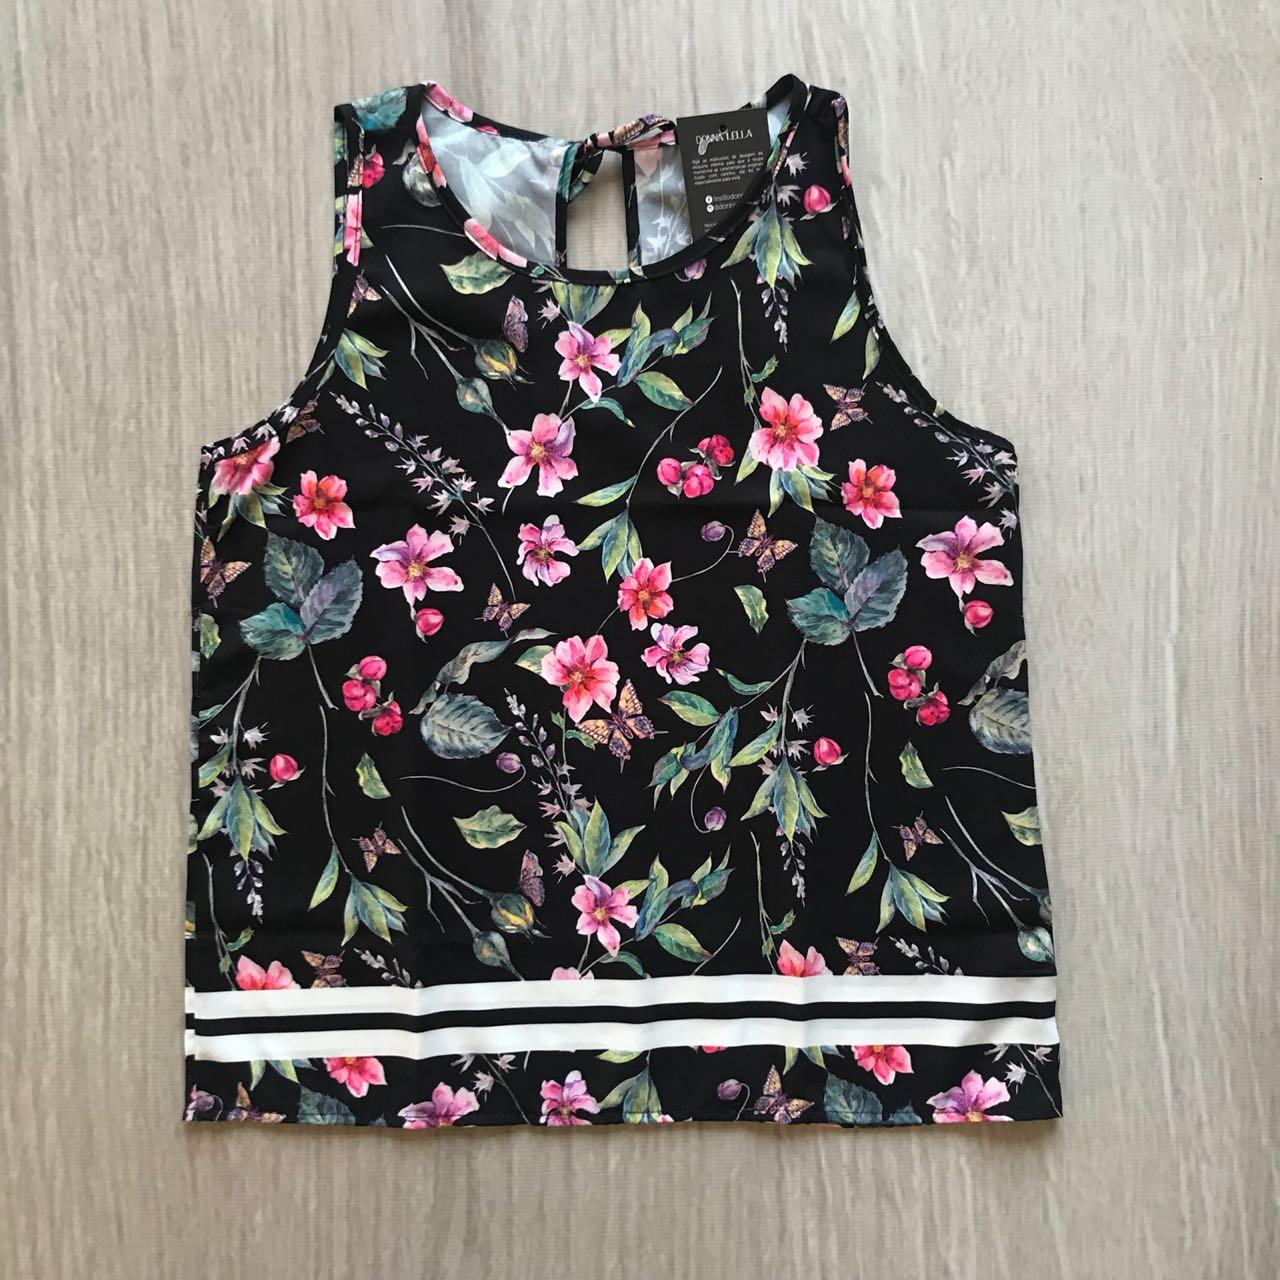 Blusa Floral Barrado Listras